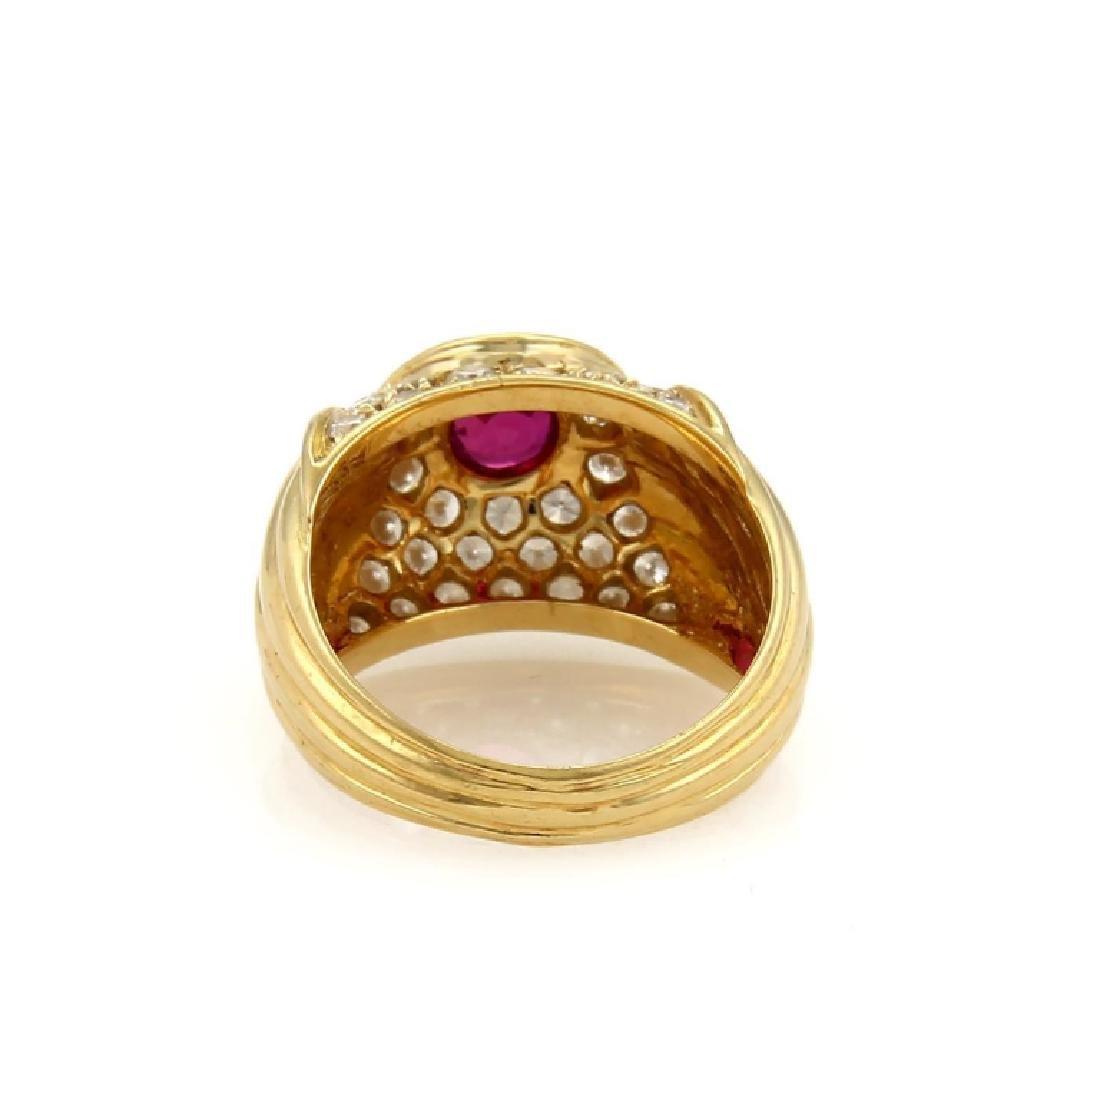 Piaget Diamond Ruby 18k Yellow Gold Dome Band - 3